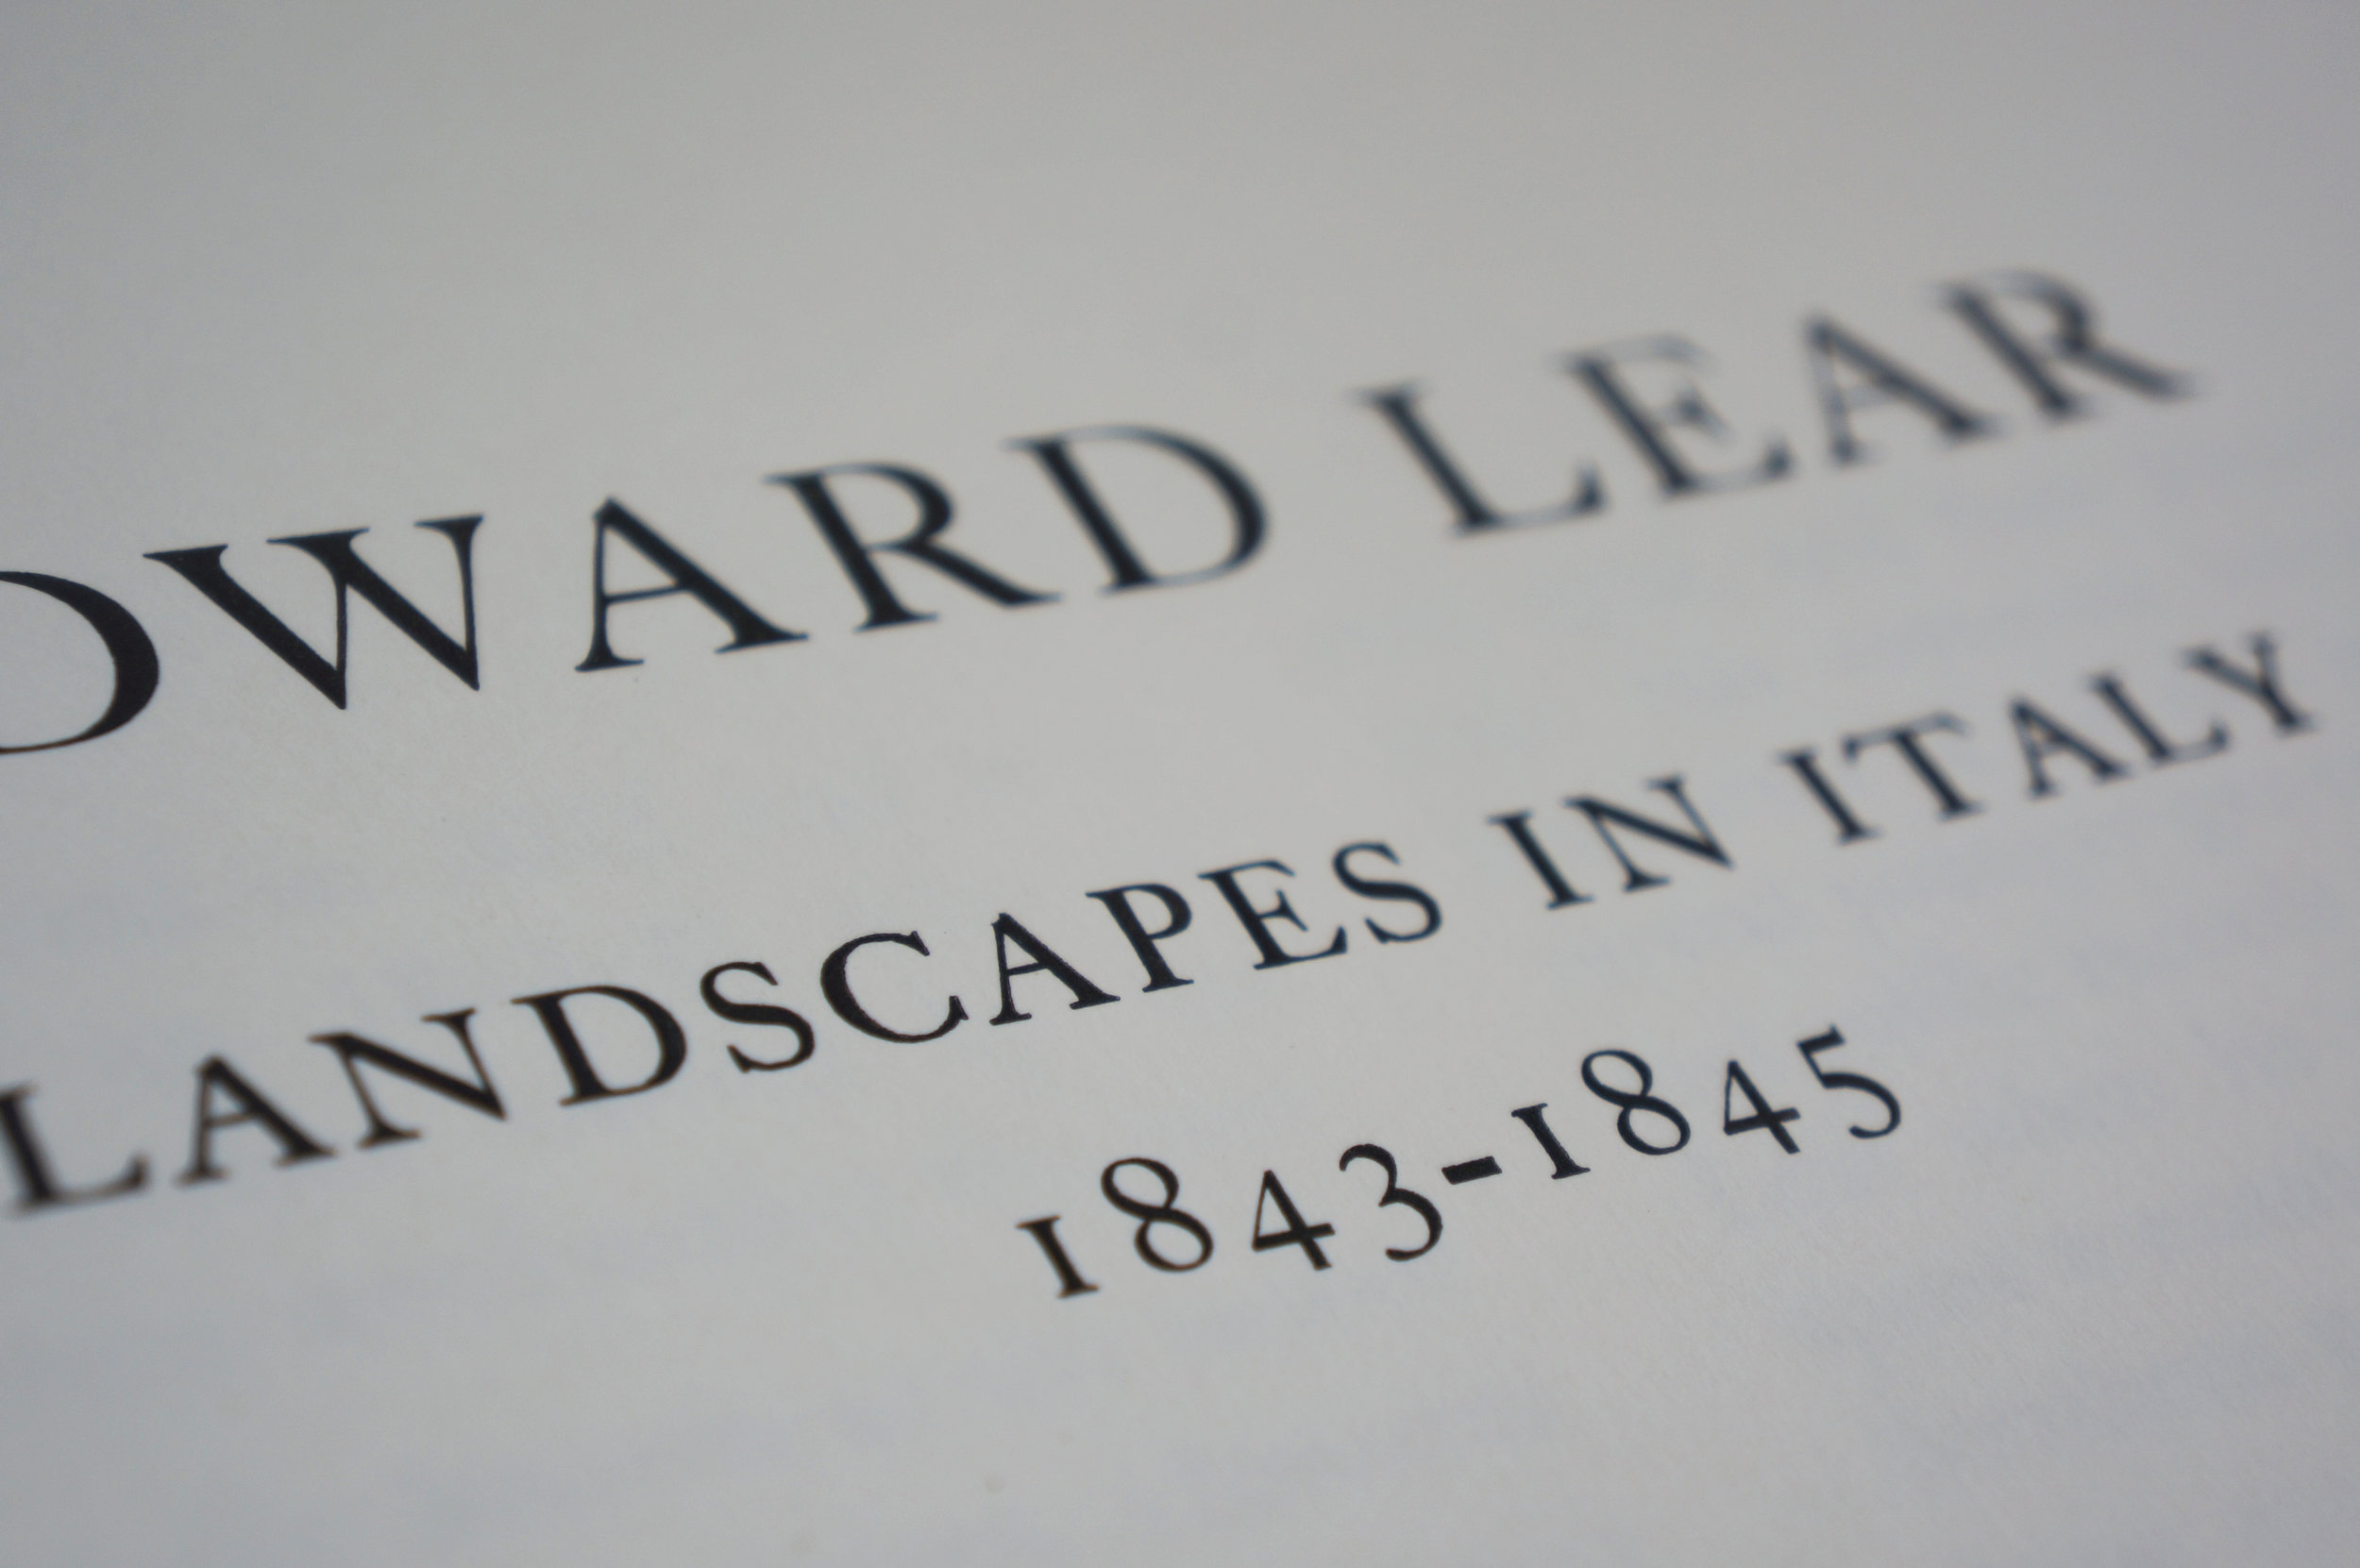 Letterpress printed title